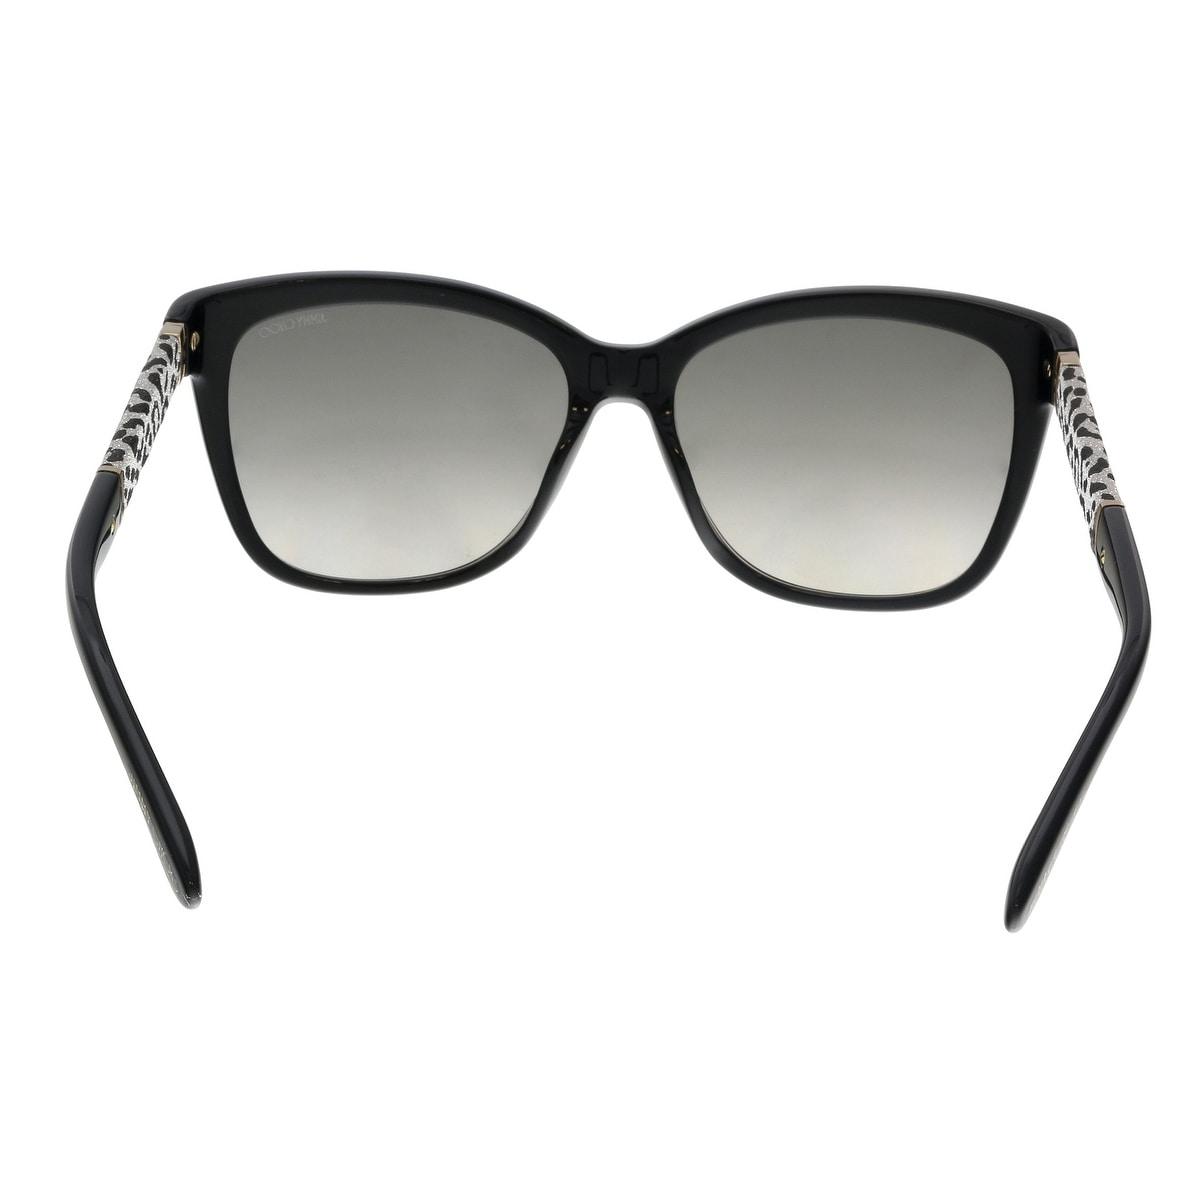 8c8b25fe504 Shop Jimmy Choo CORA S FA3 Black Glitter Square Sunglasses - No Size - Free  Shipping Today - Overstock - 22818035